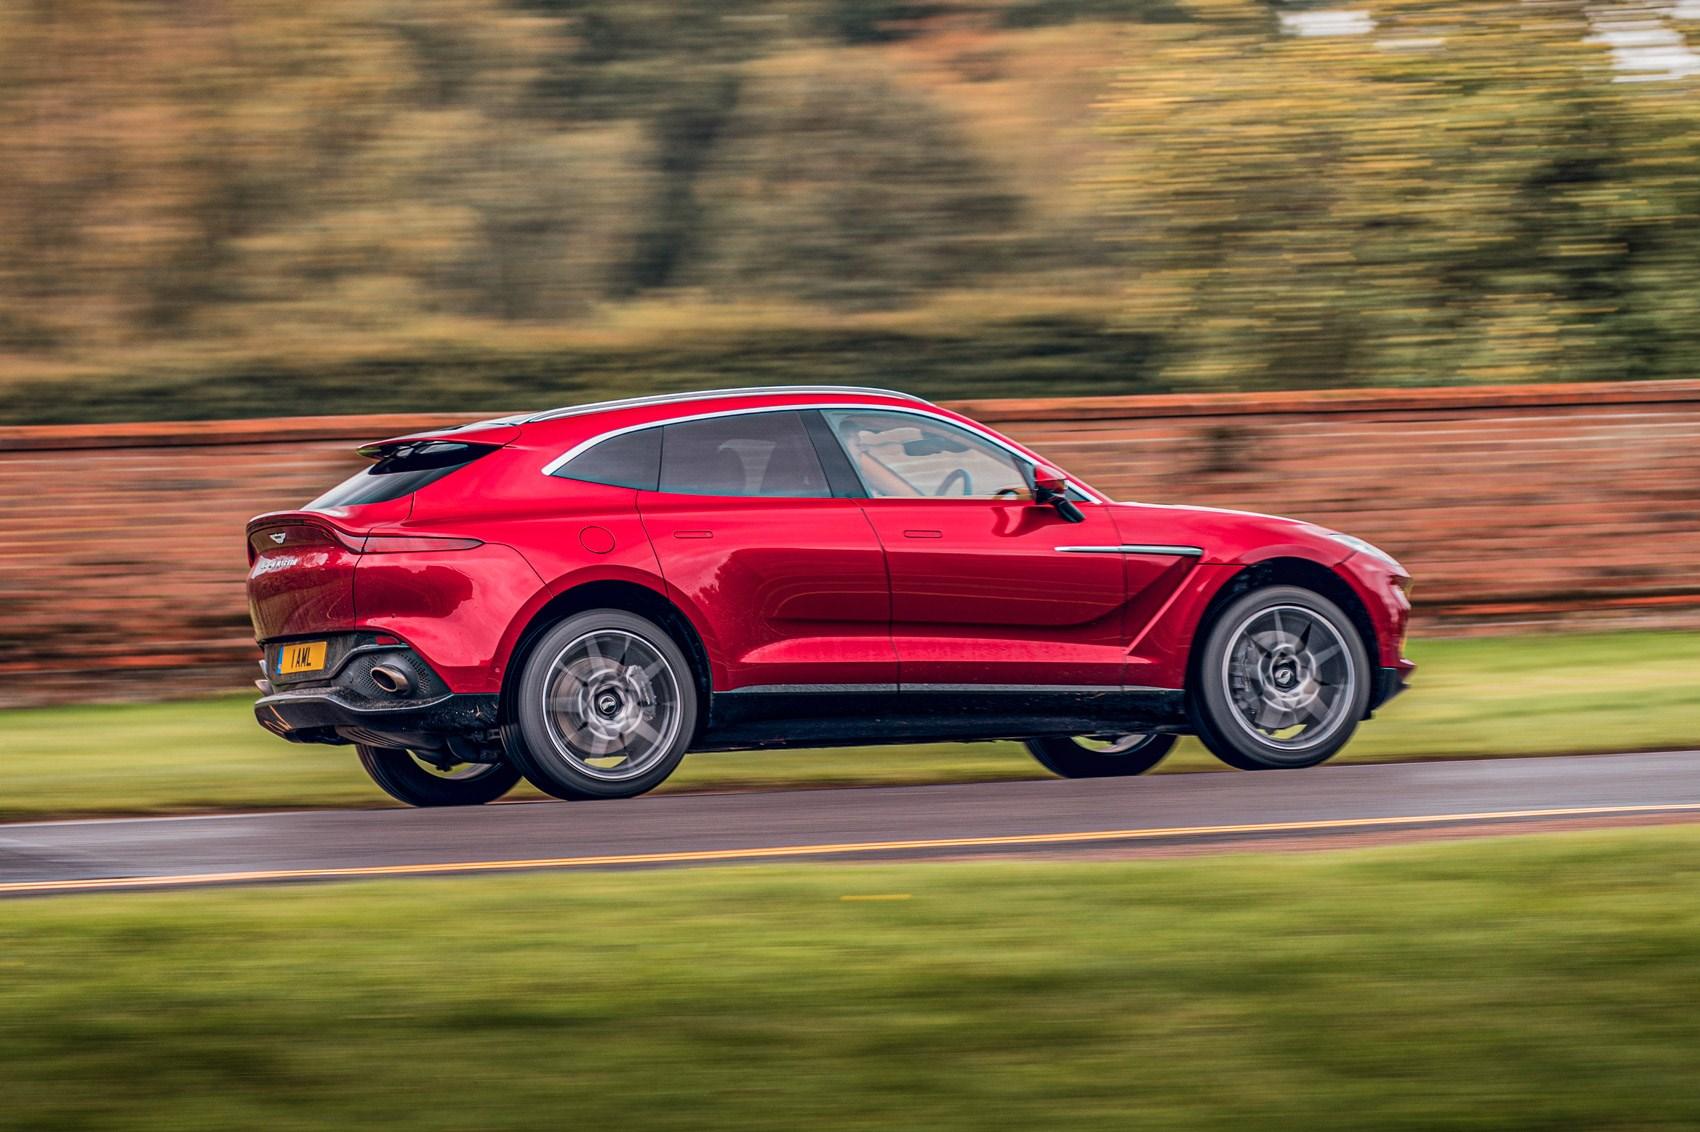 Aston Martin Dbx Vs Lamborghini Urus Vs Bentley Bentayga Triple Test 2020 Review Car Magazine